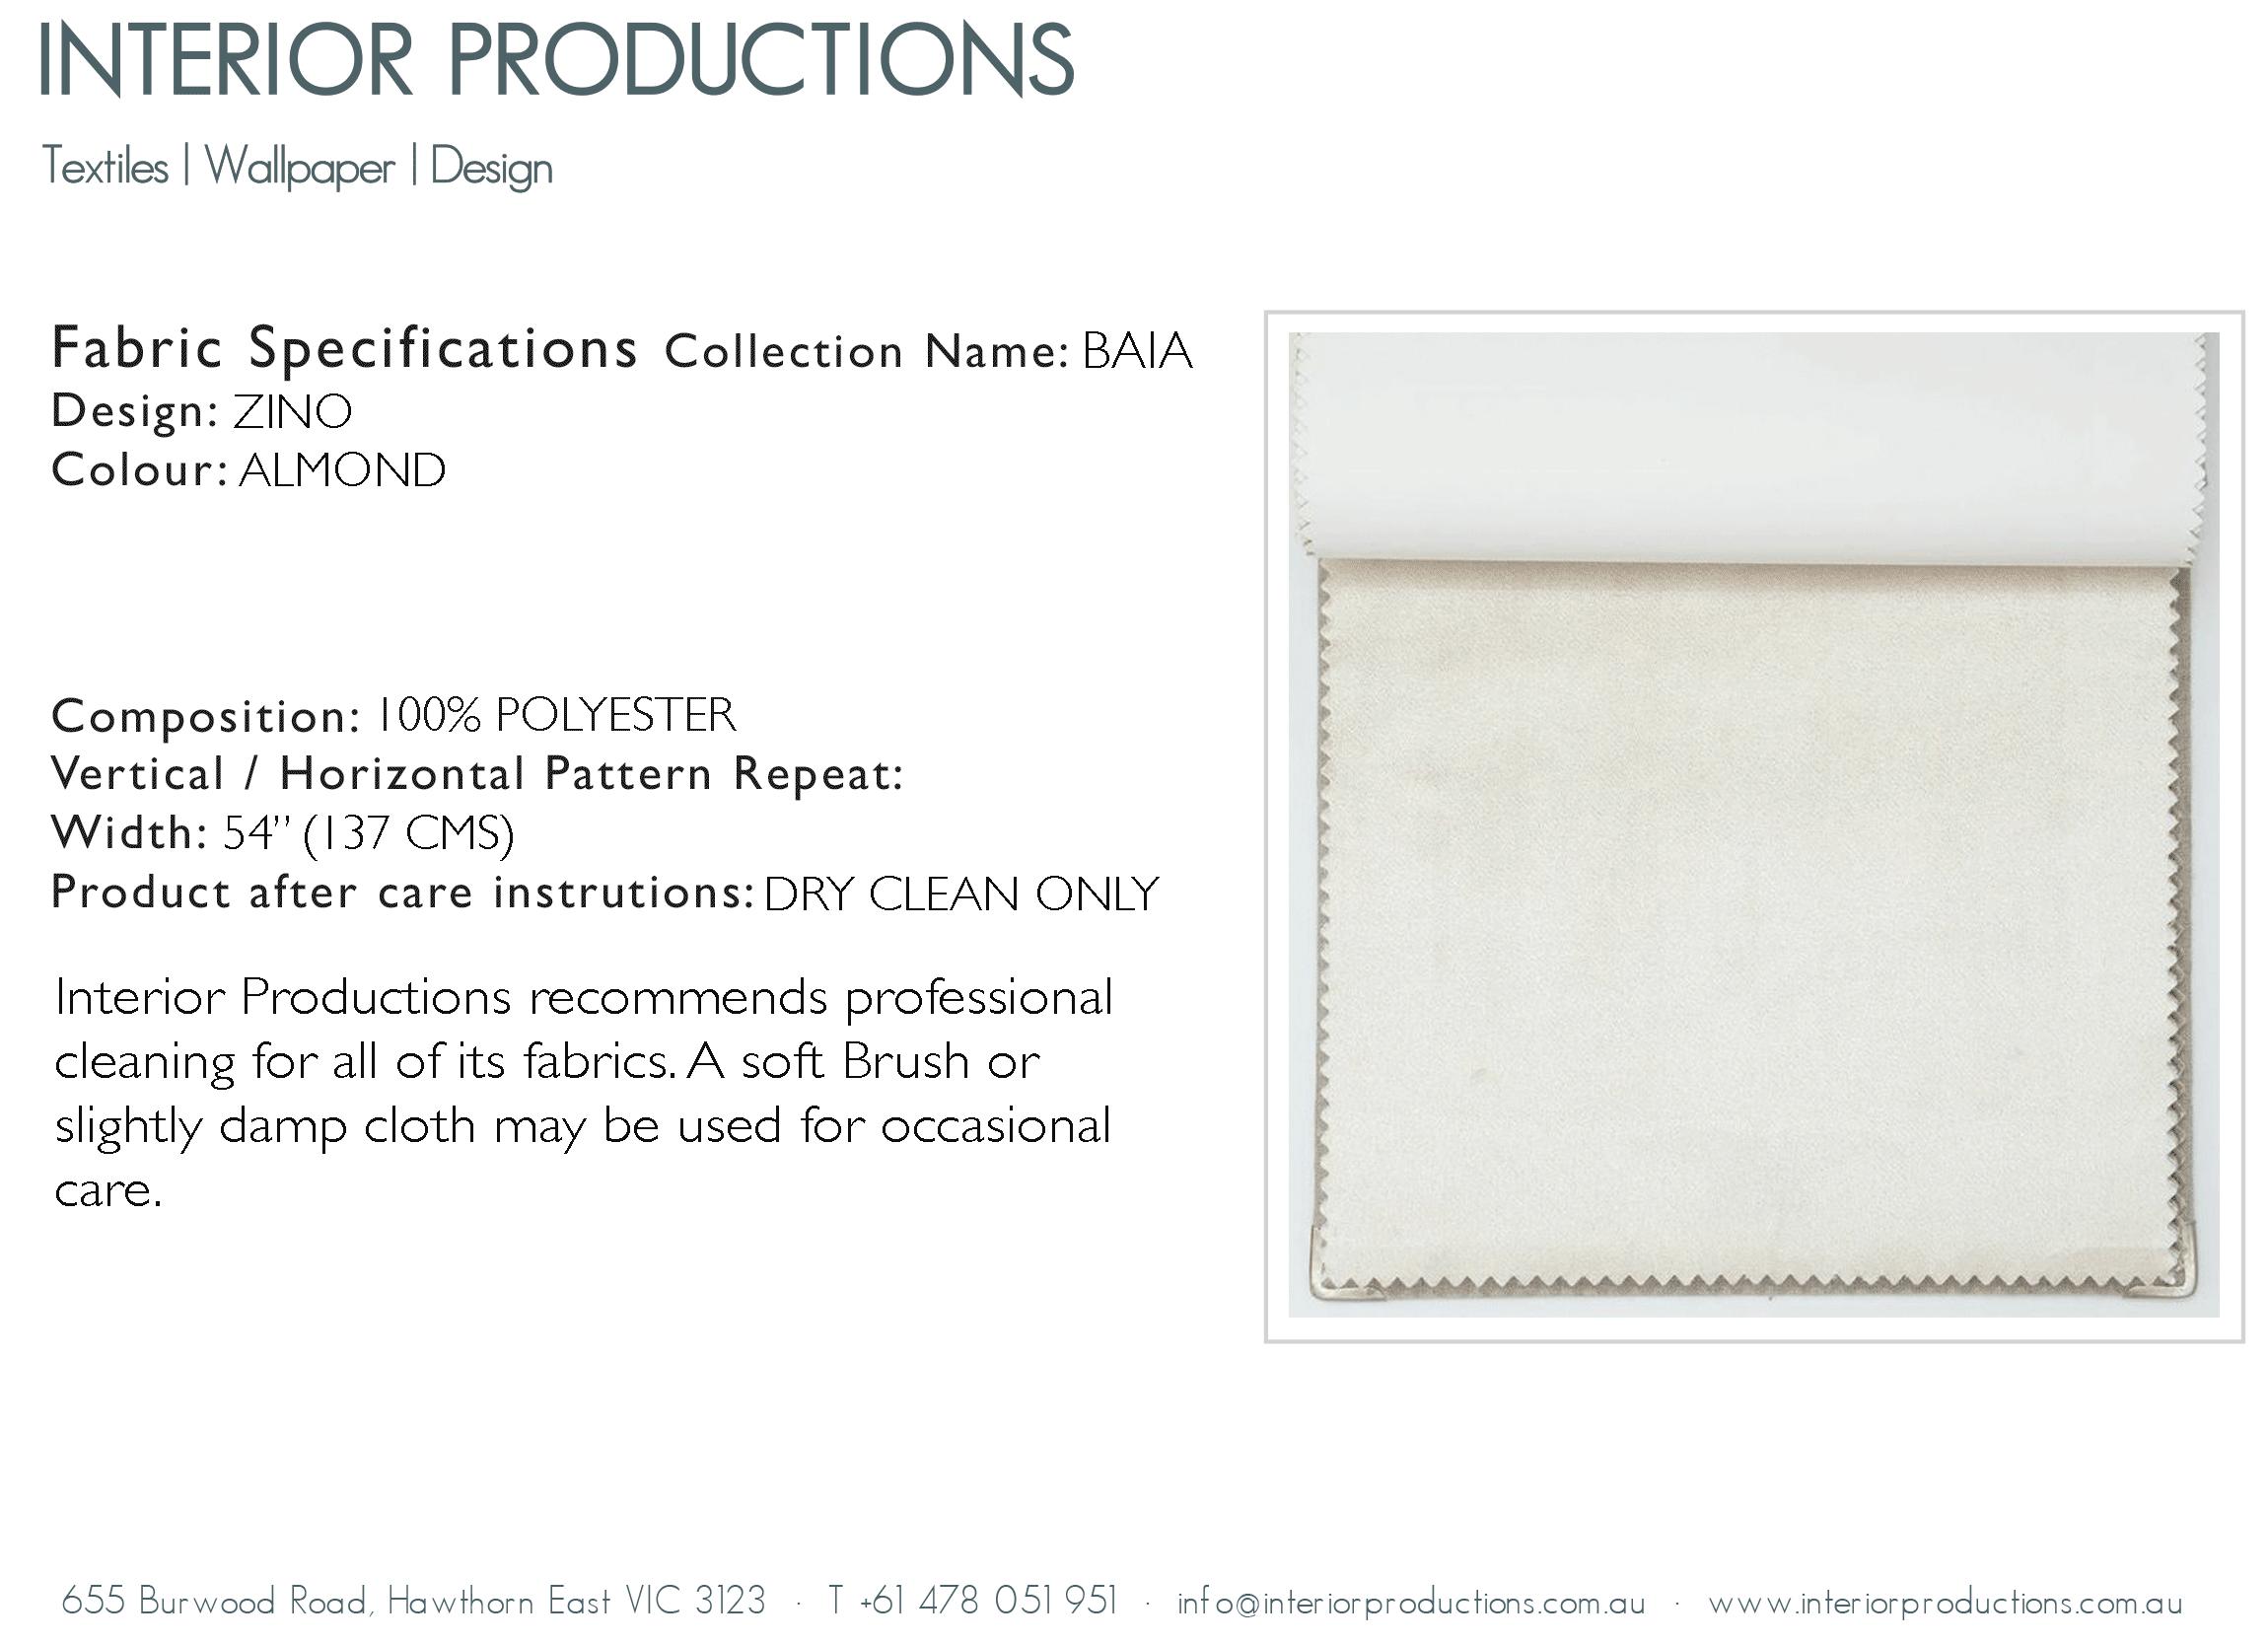 interior_productions_ZINO---ALMOND